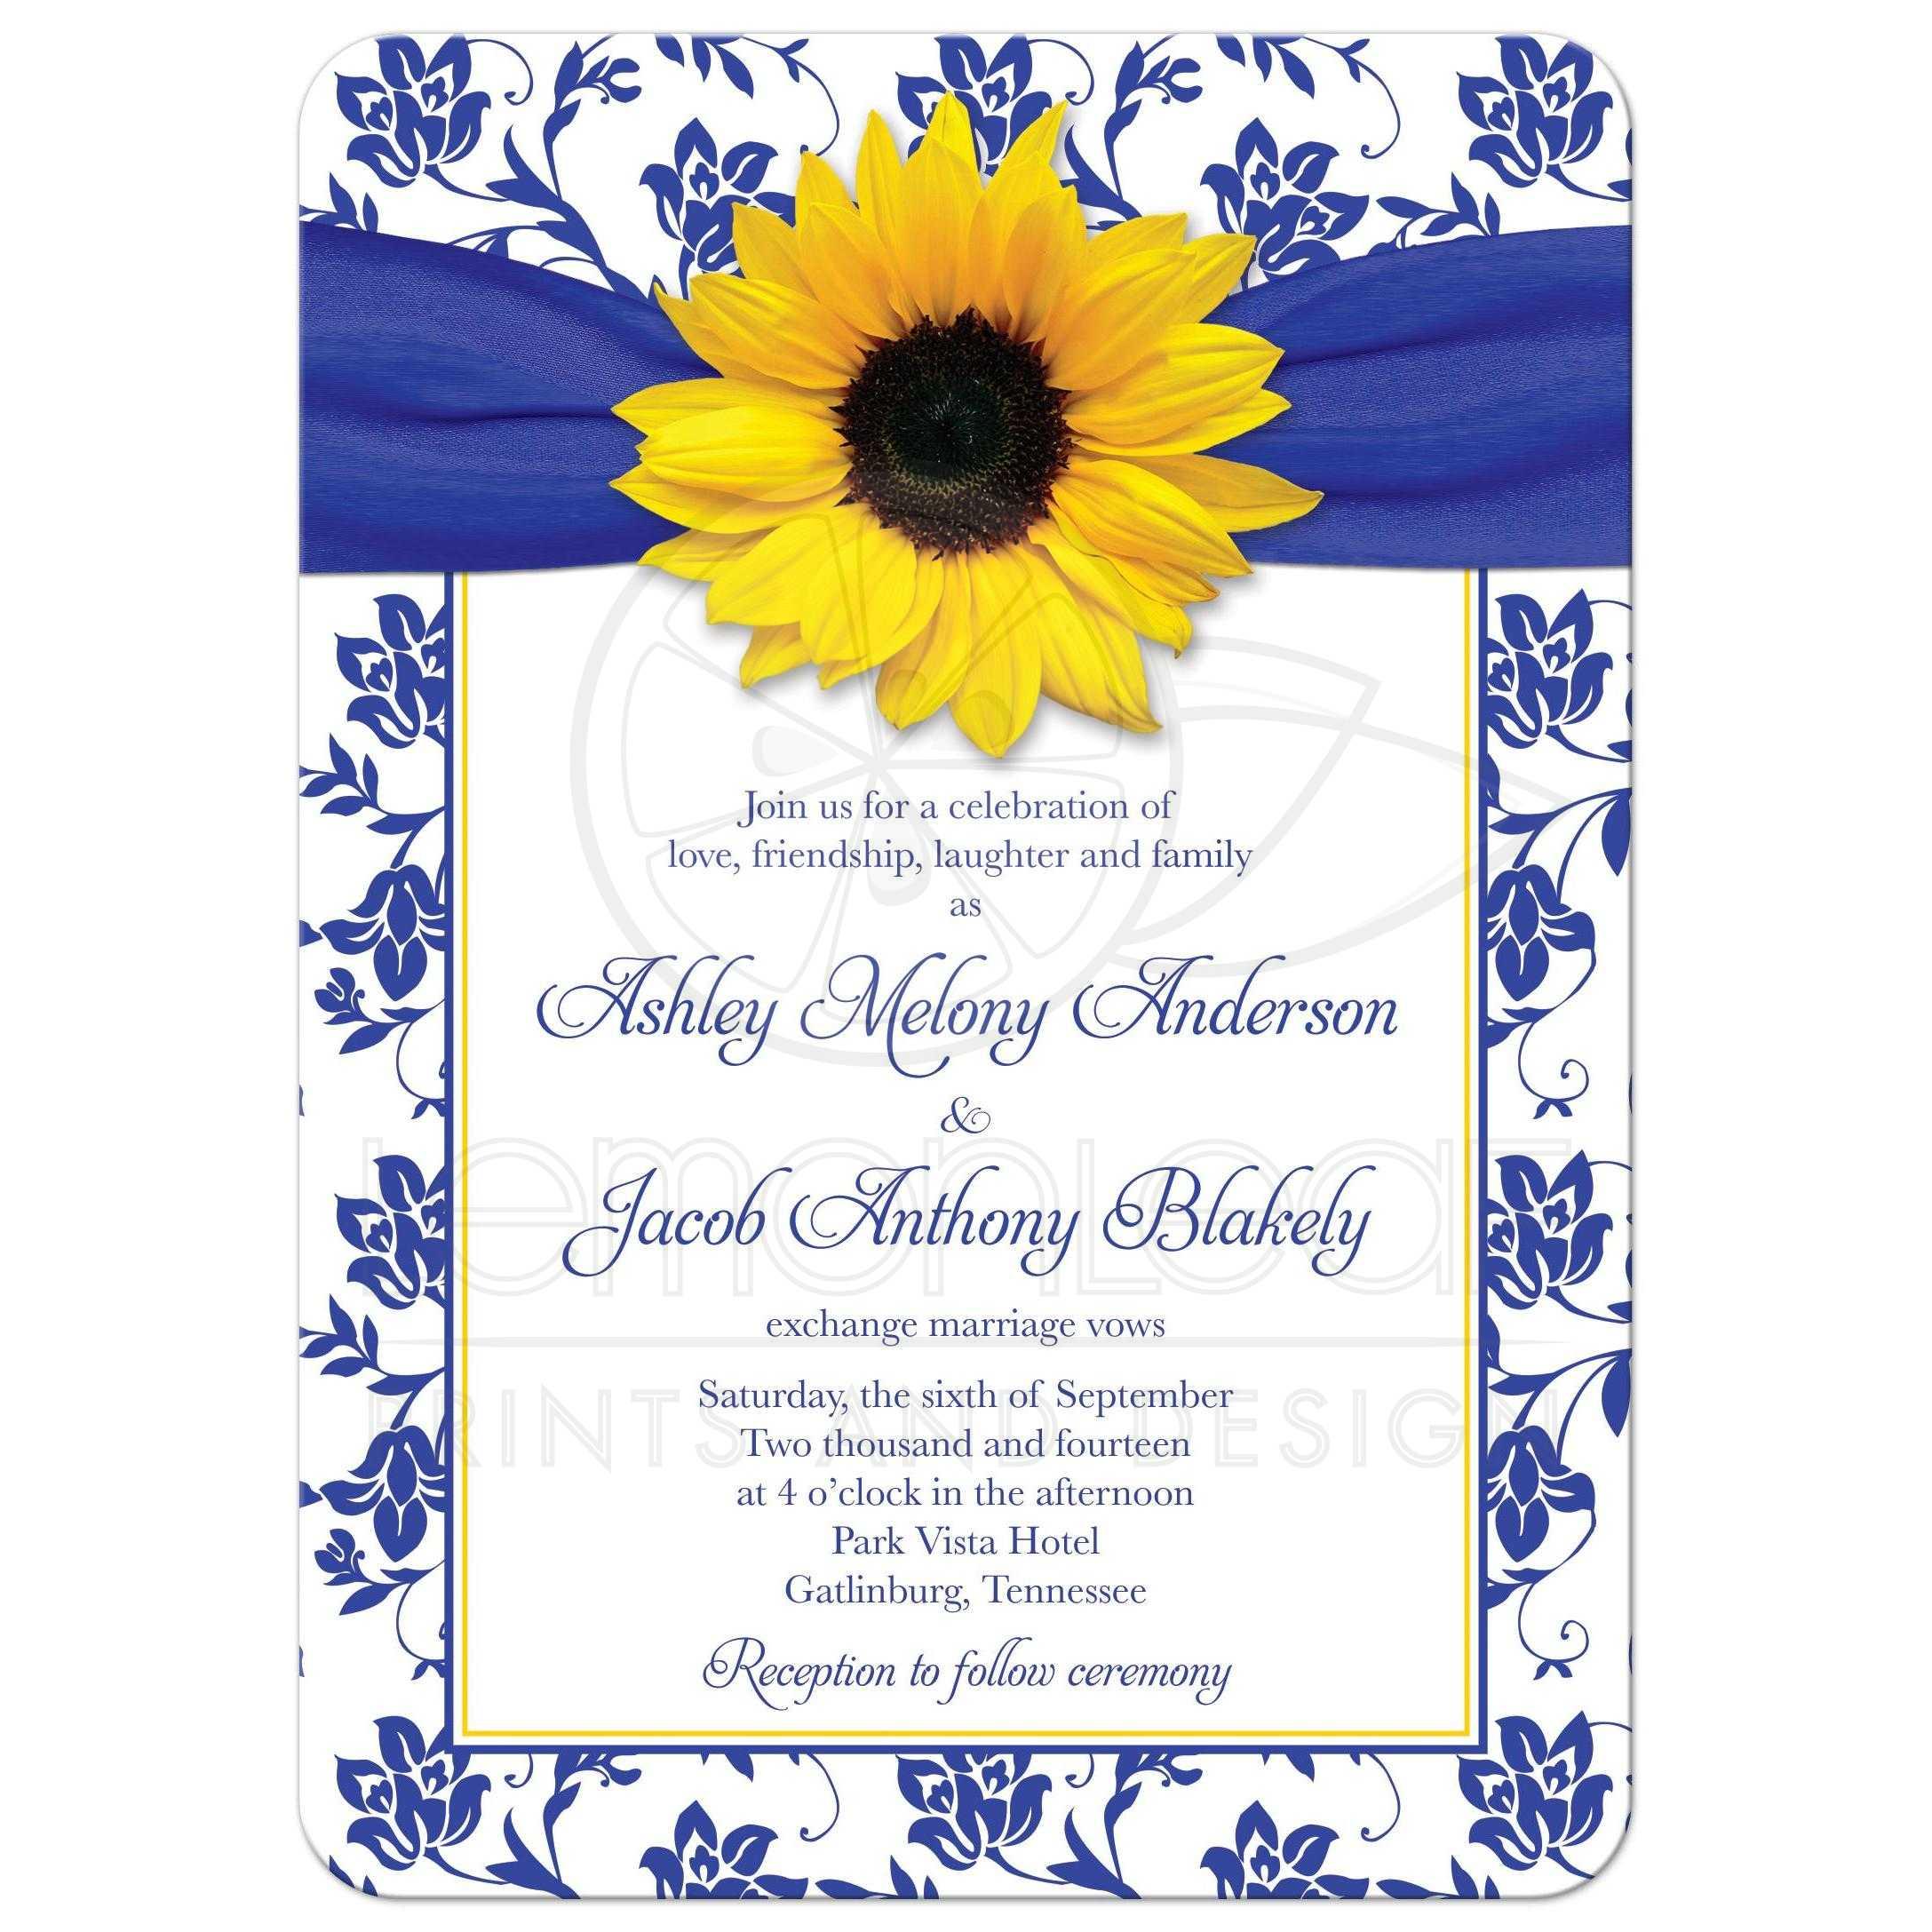 wedding invitation  sunflower damask royal blue yellow